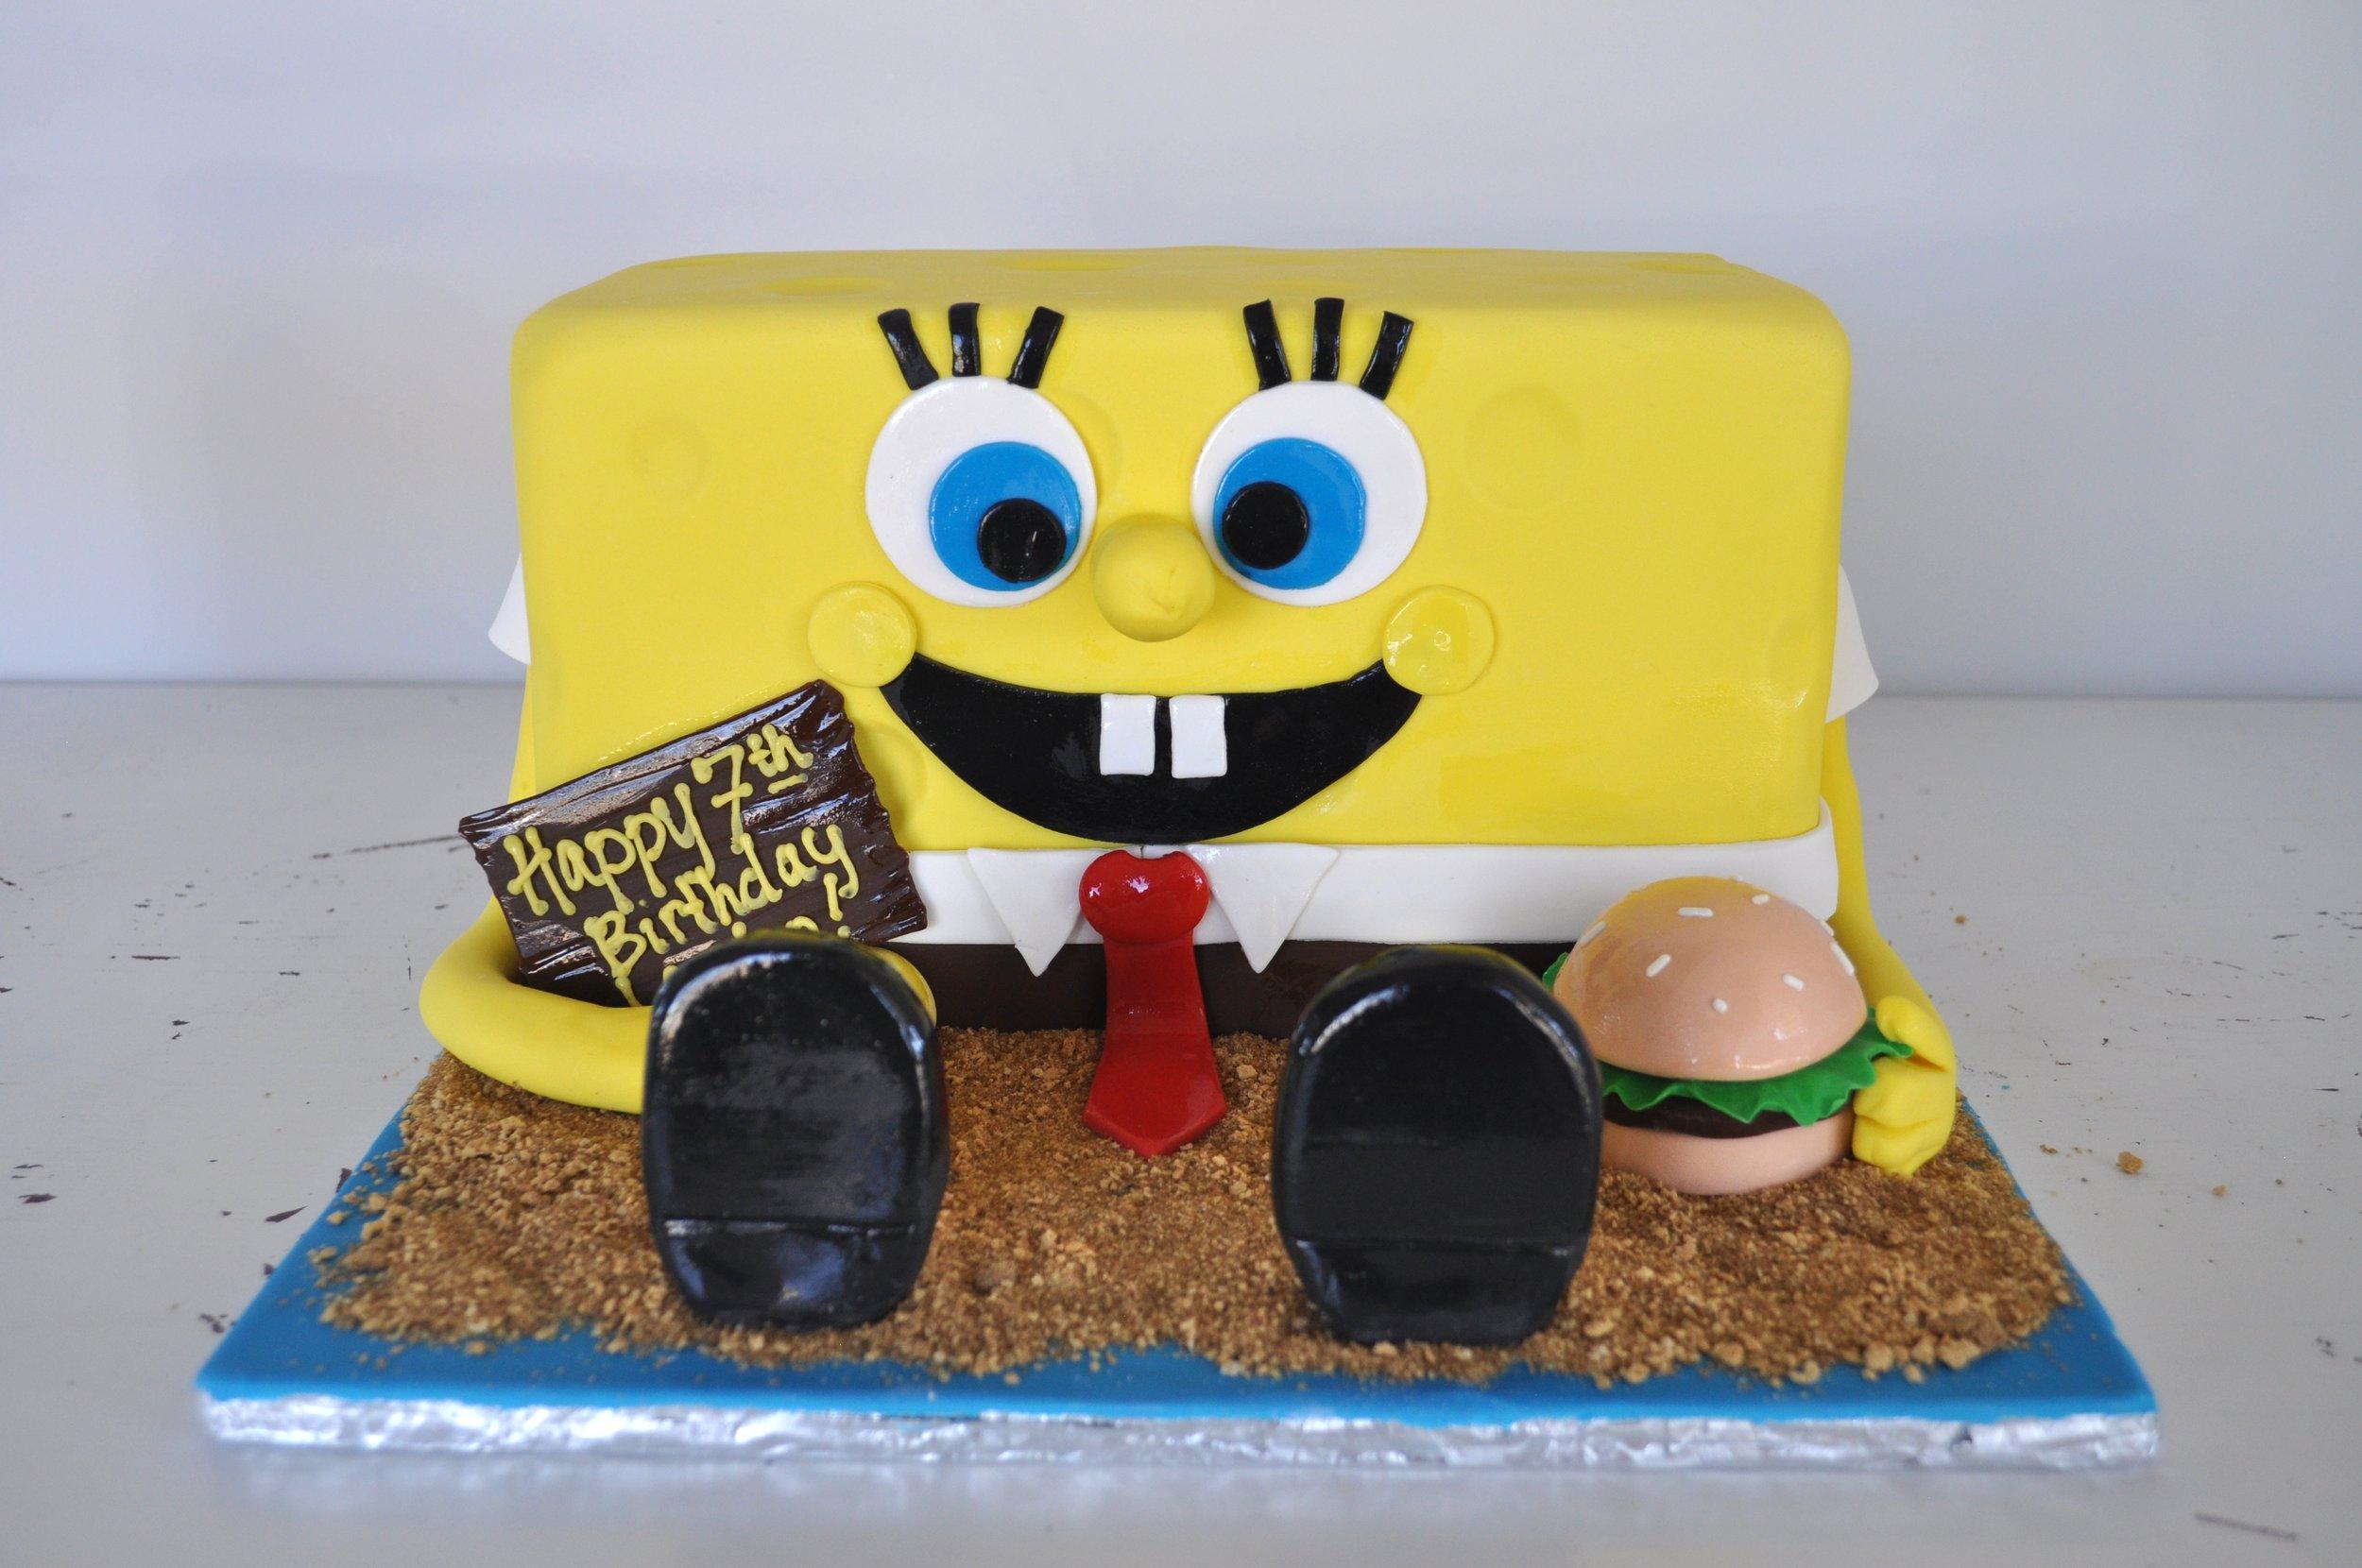 custom-cake-spongebob-sugarbeesweets.jpg